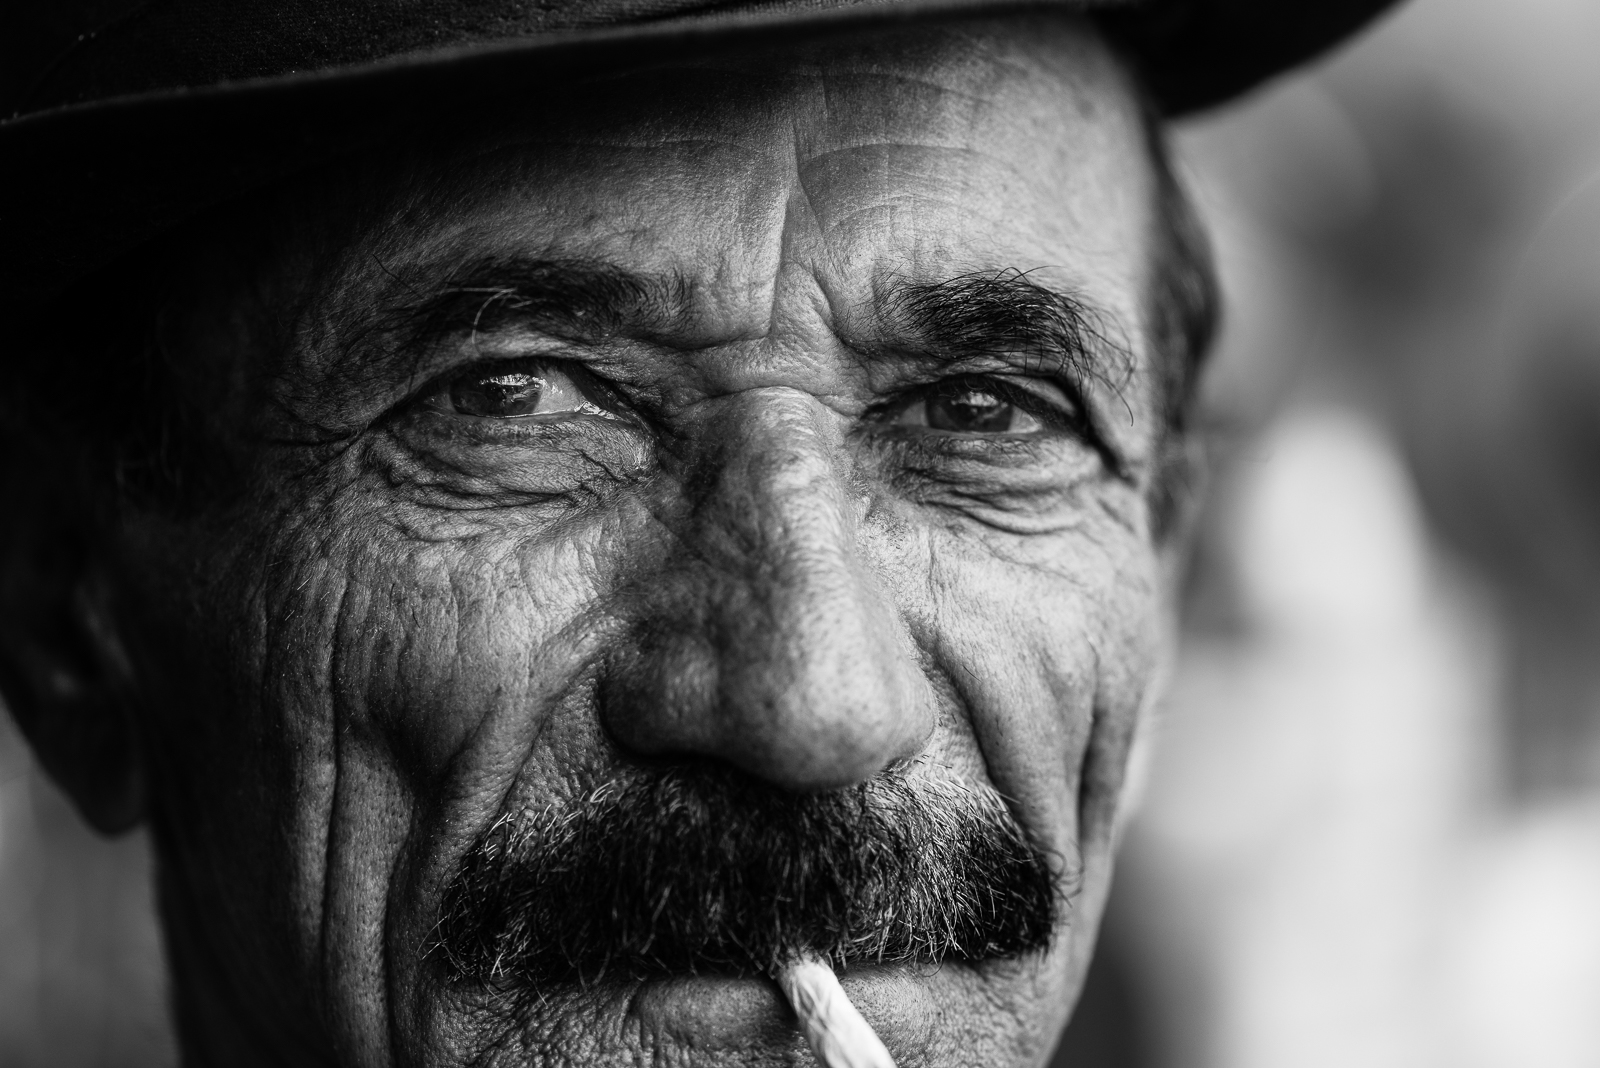 The smoker, Gaziantep